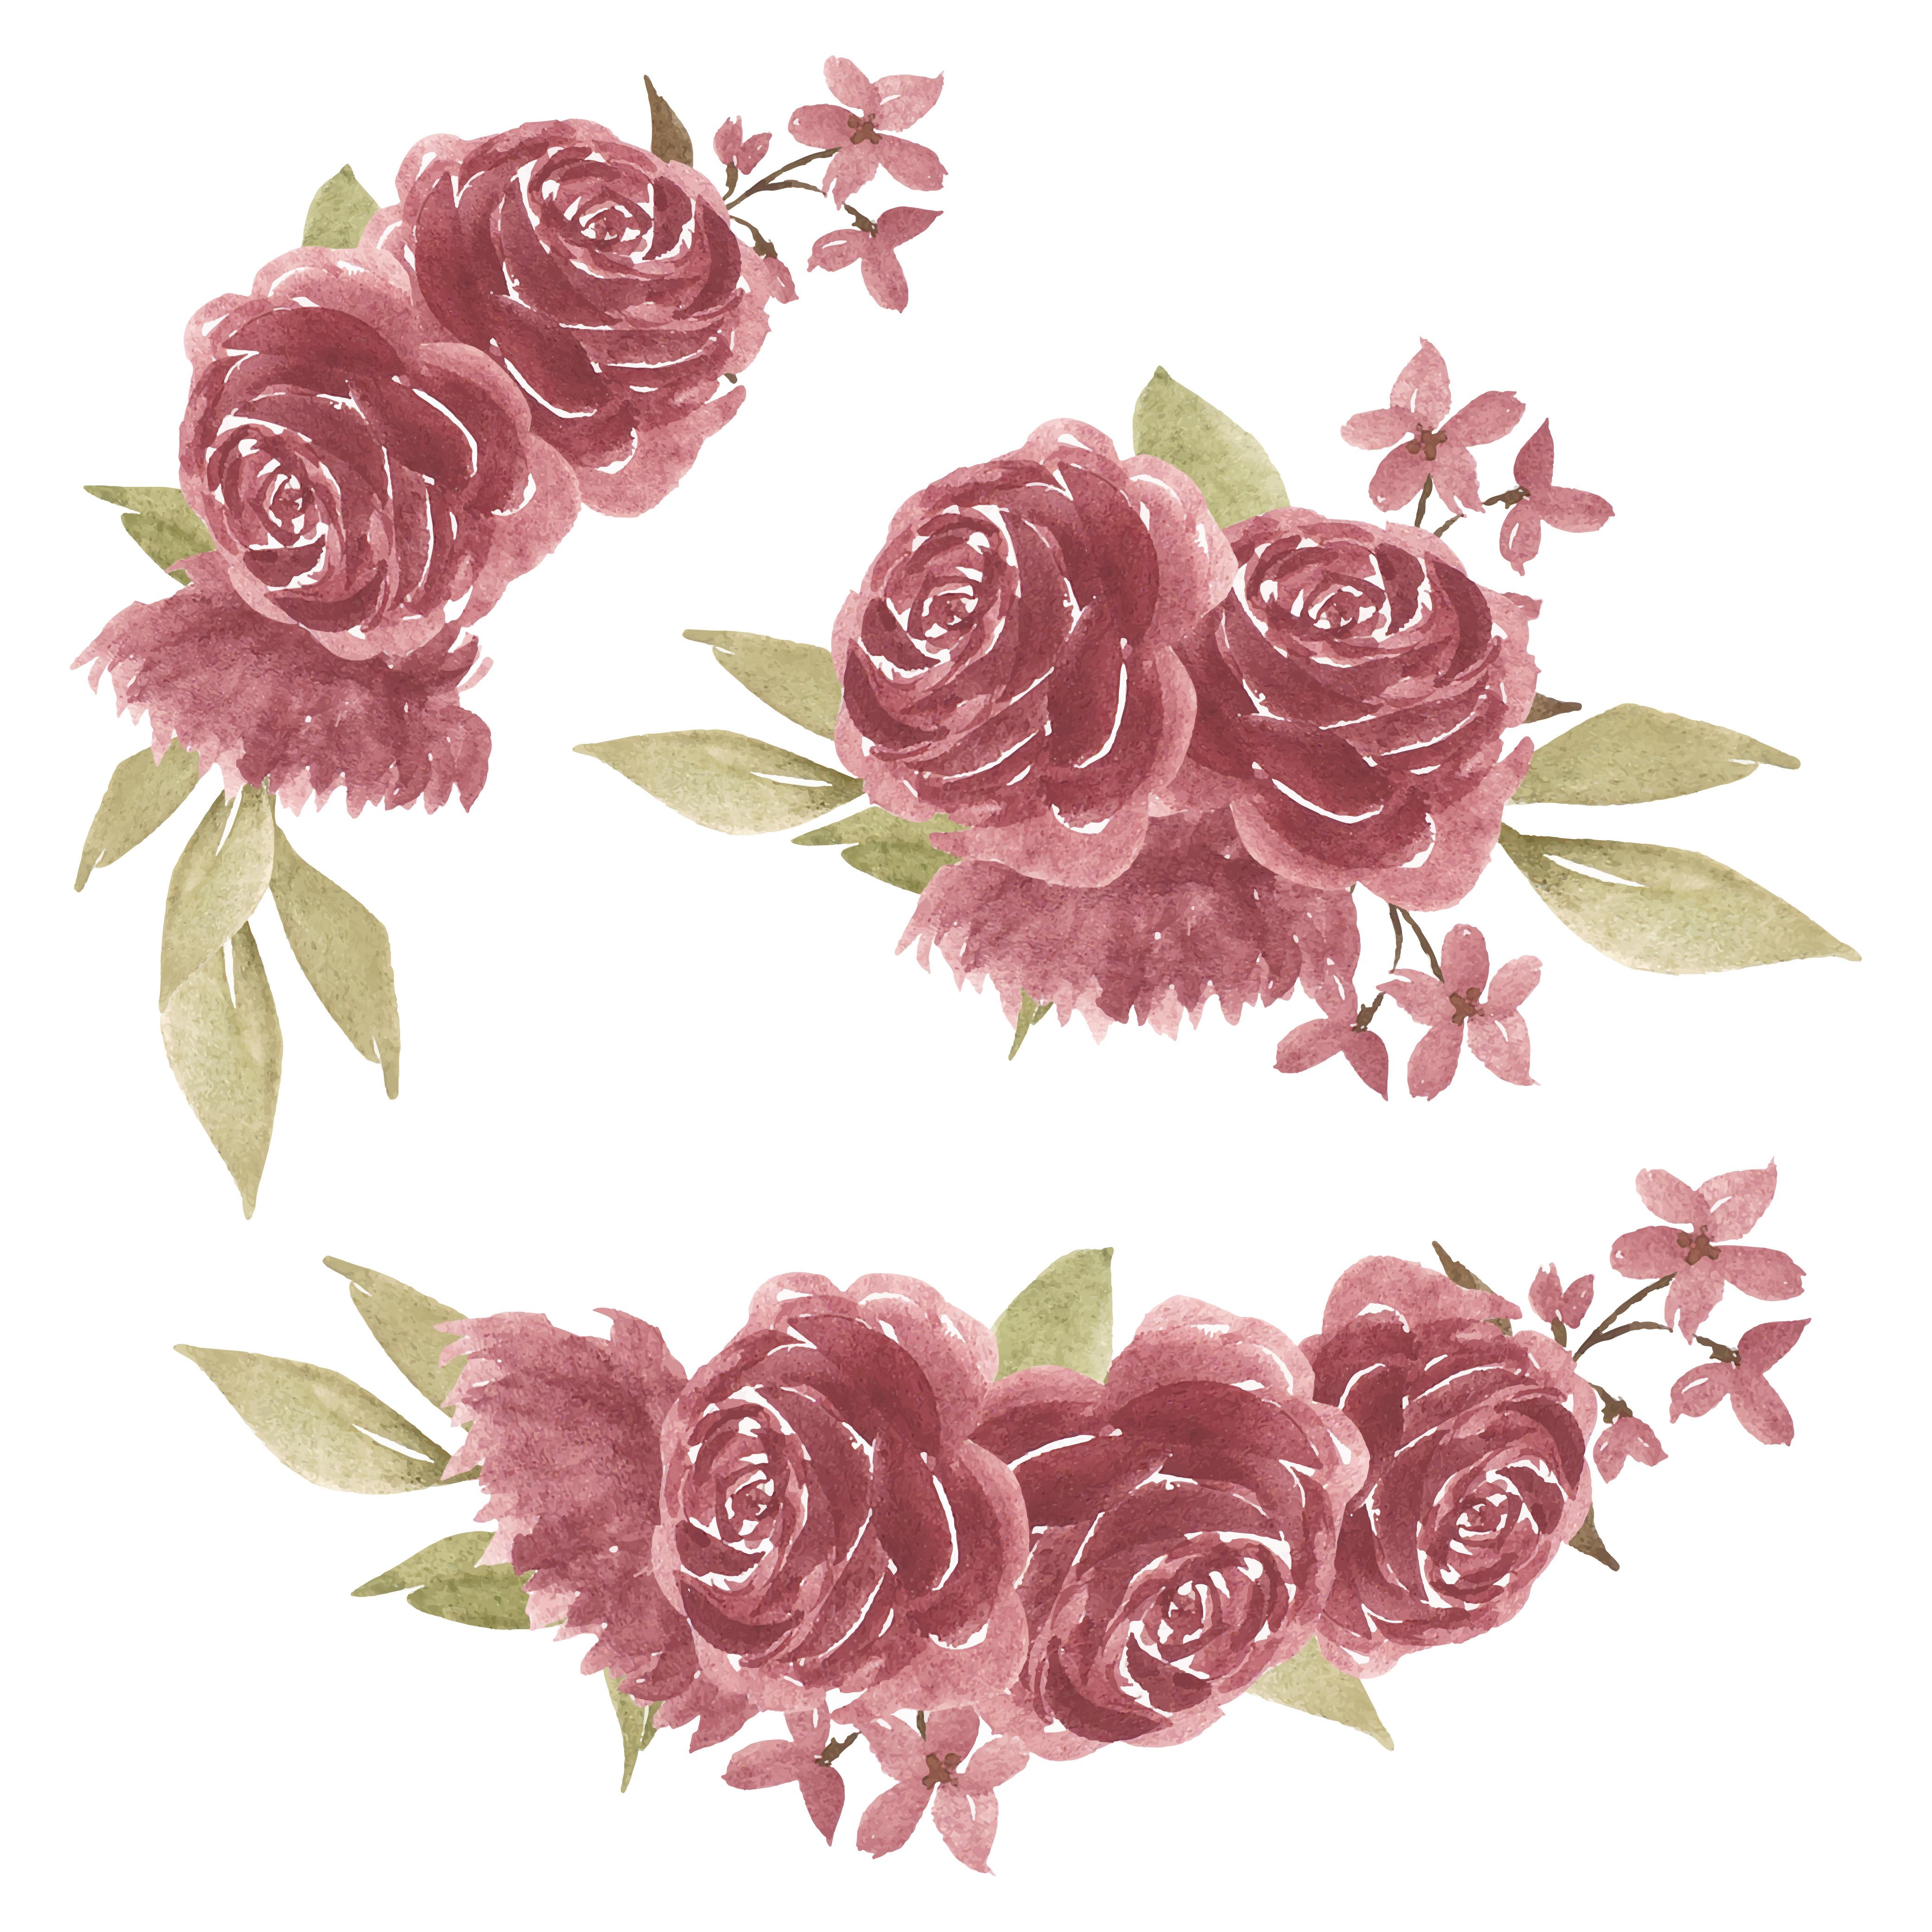 Set Of Watercolor Rose Flower Arrangements